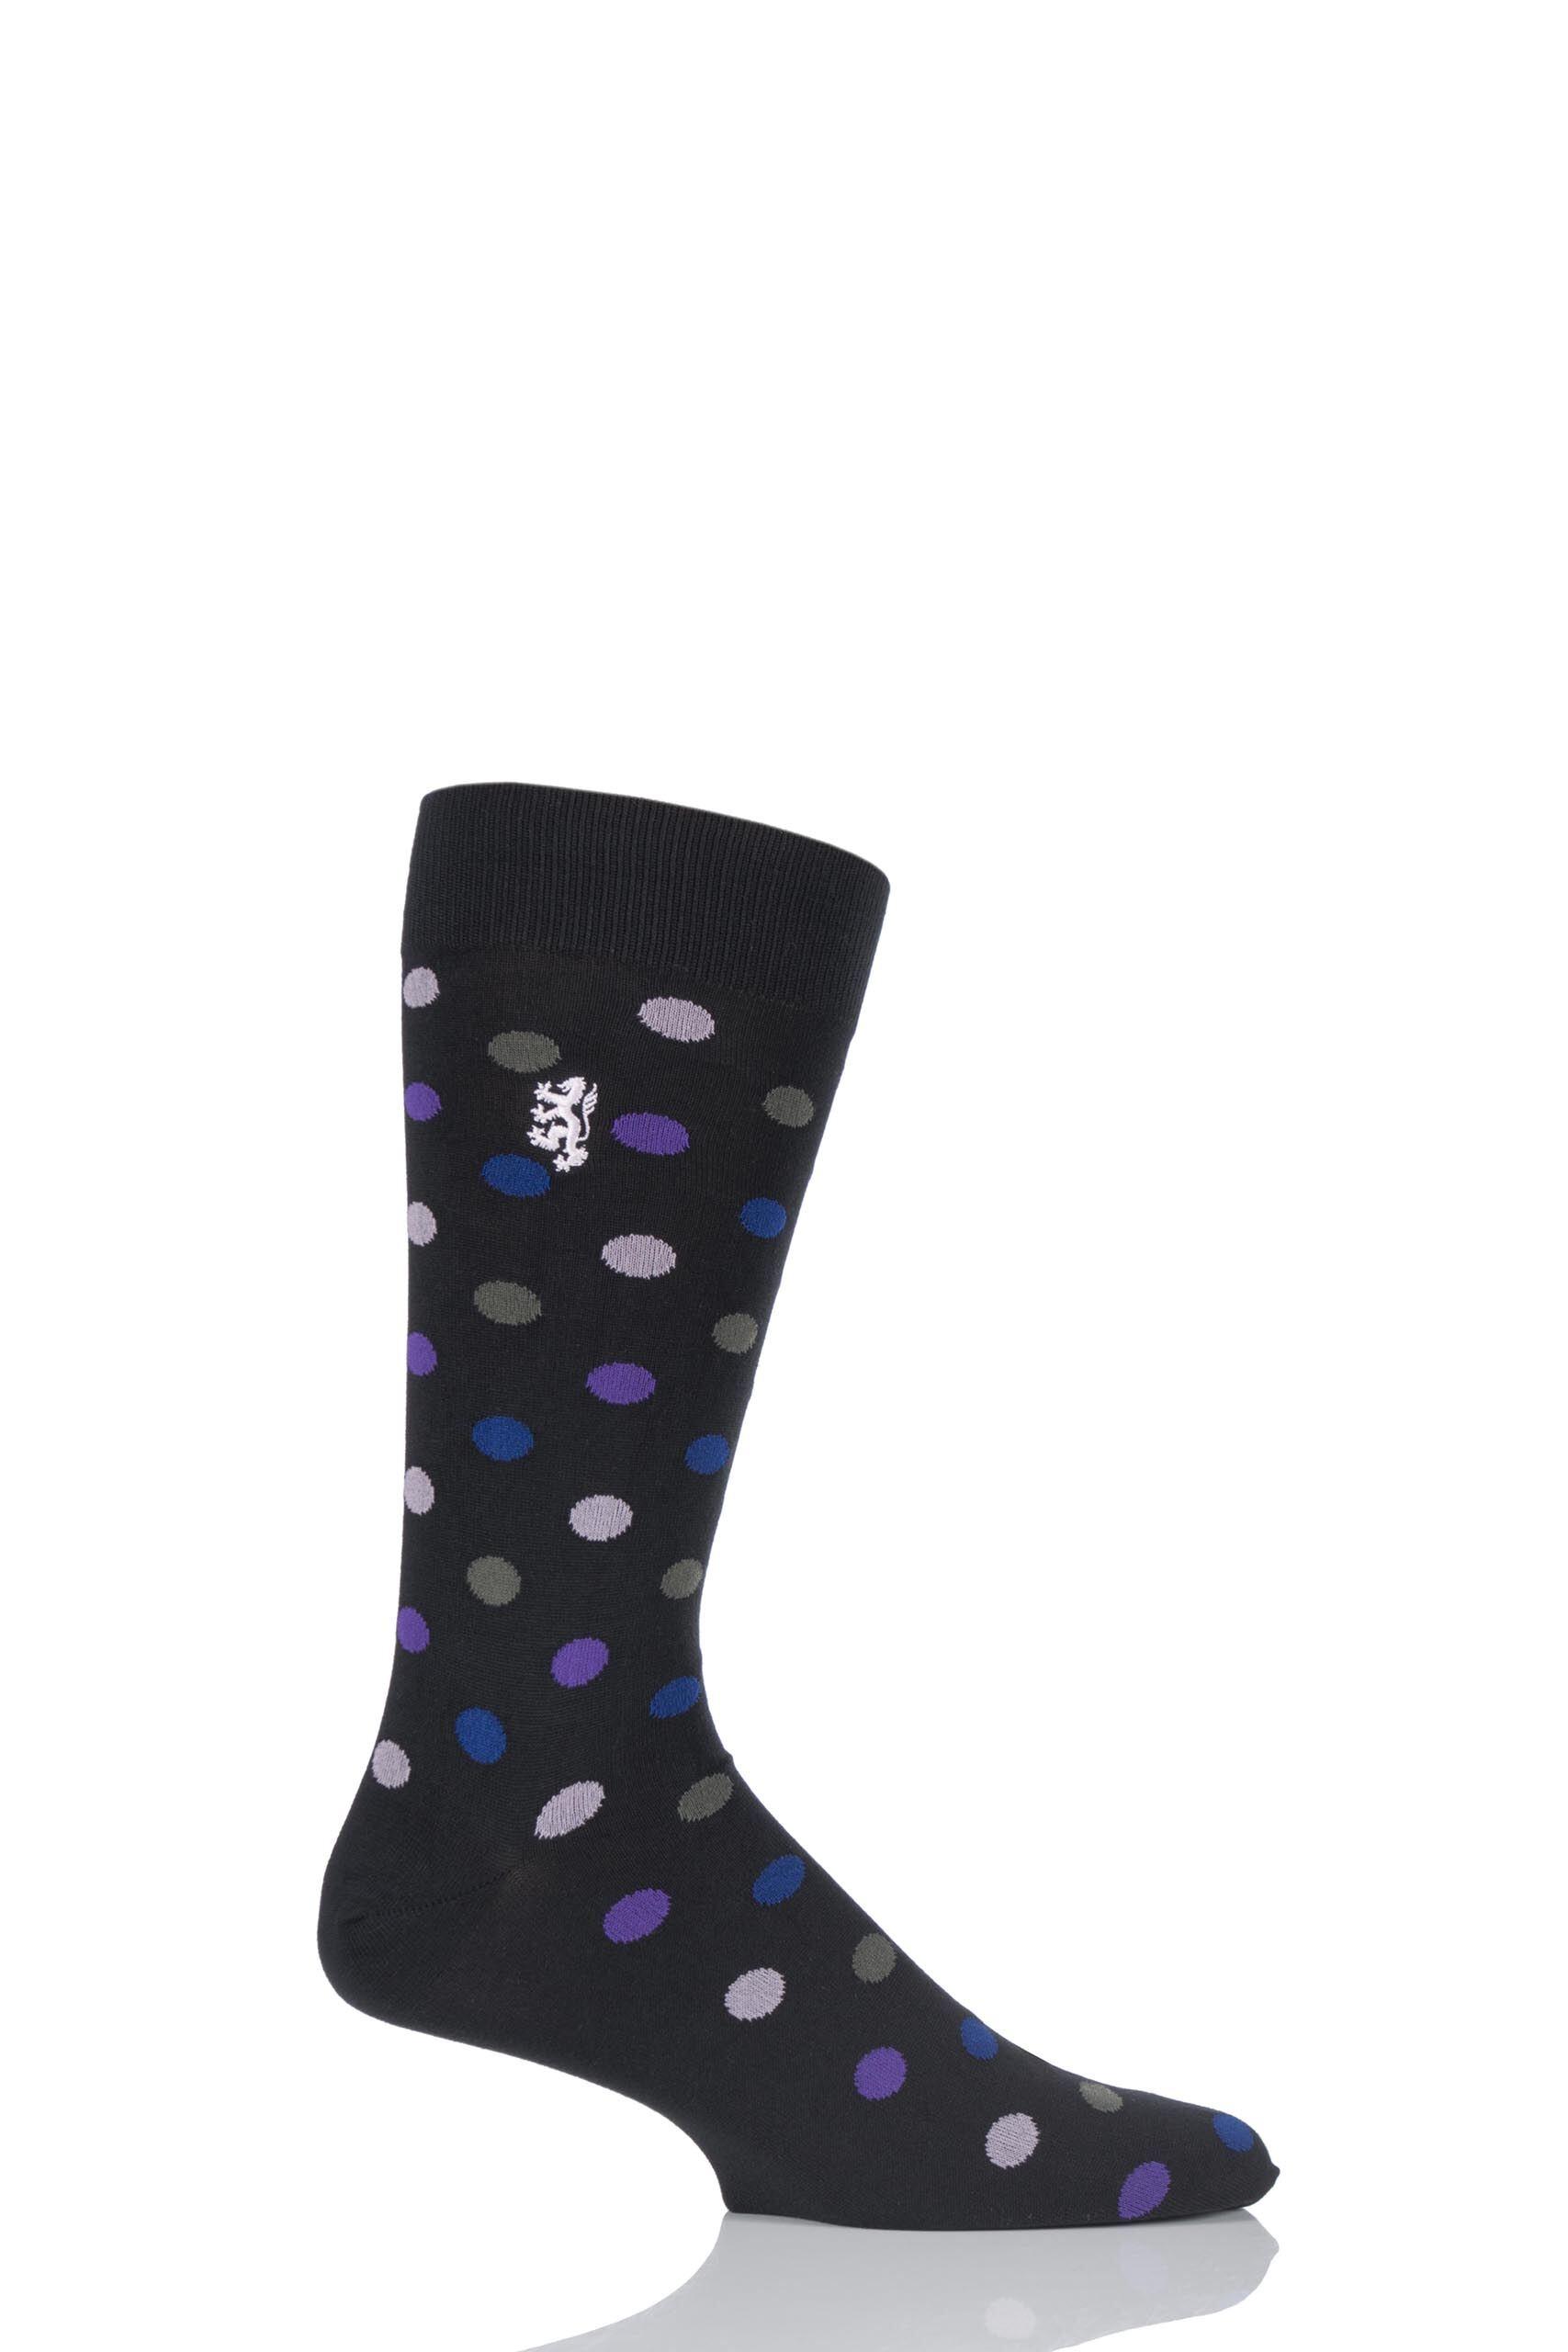 Image of 1 Pair Black 80% Sea Island Cotton Spots Socks Men's 6-8.5 Mens - Pringle of Scotland